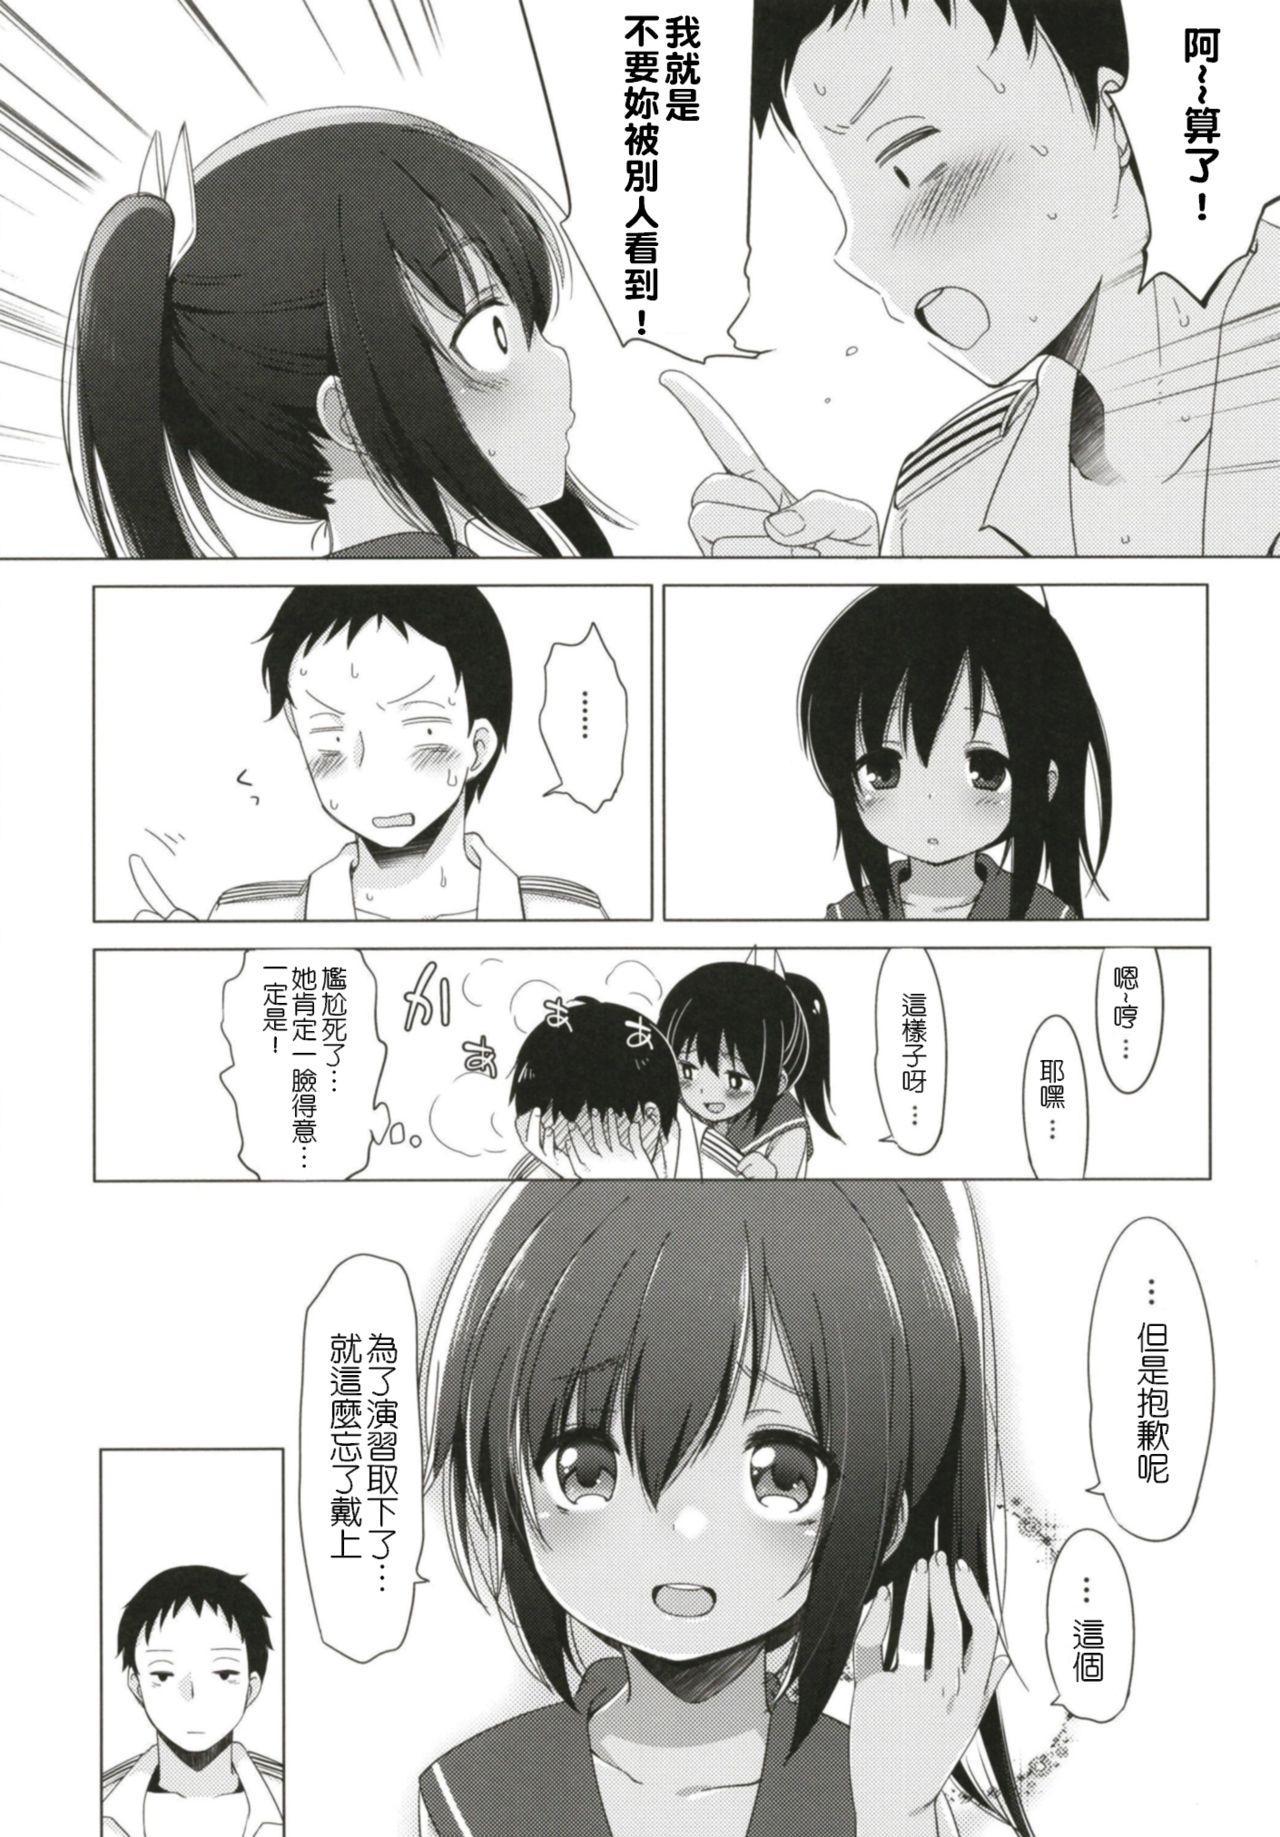 [French letter (Fujisaki Hikari)] Hitonatsu no Ayamachi -I-401 Soushuuhen- (Kantai Collection -KanColle-) [Chinese] [Digital] 21